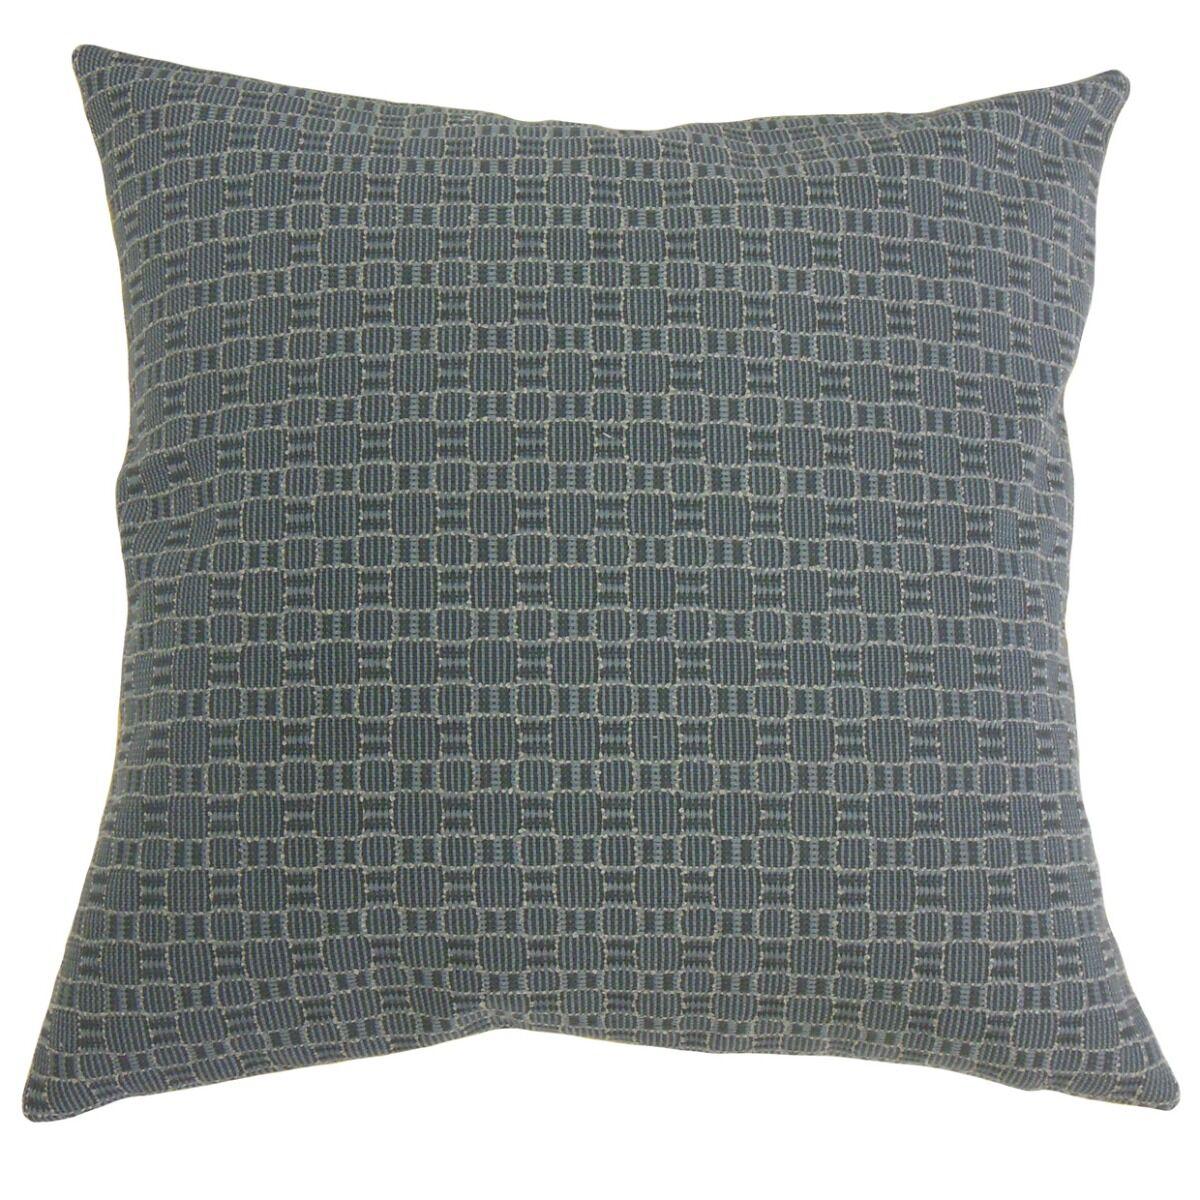 Sunday Plaid Pillow Size: 20